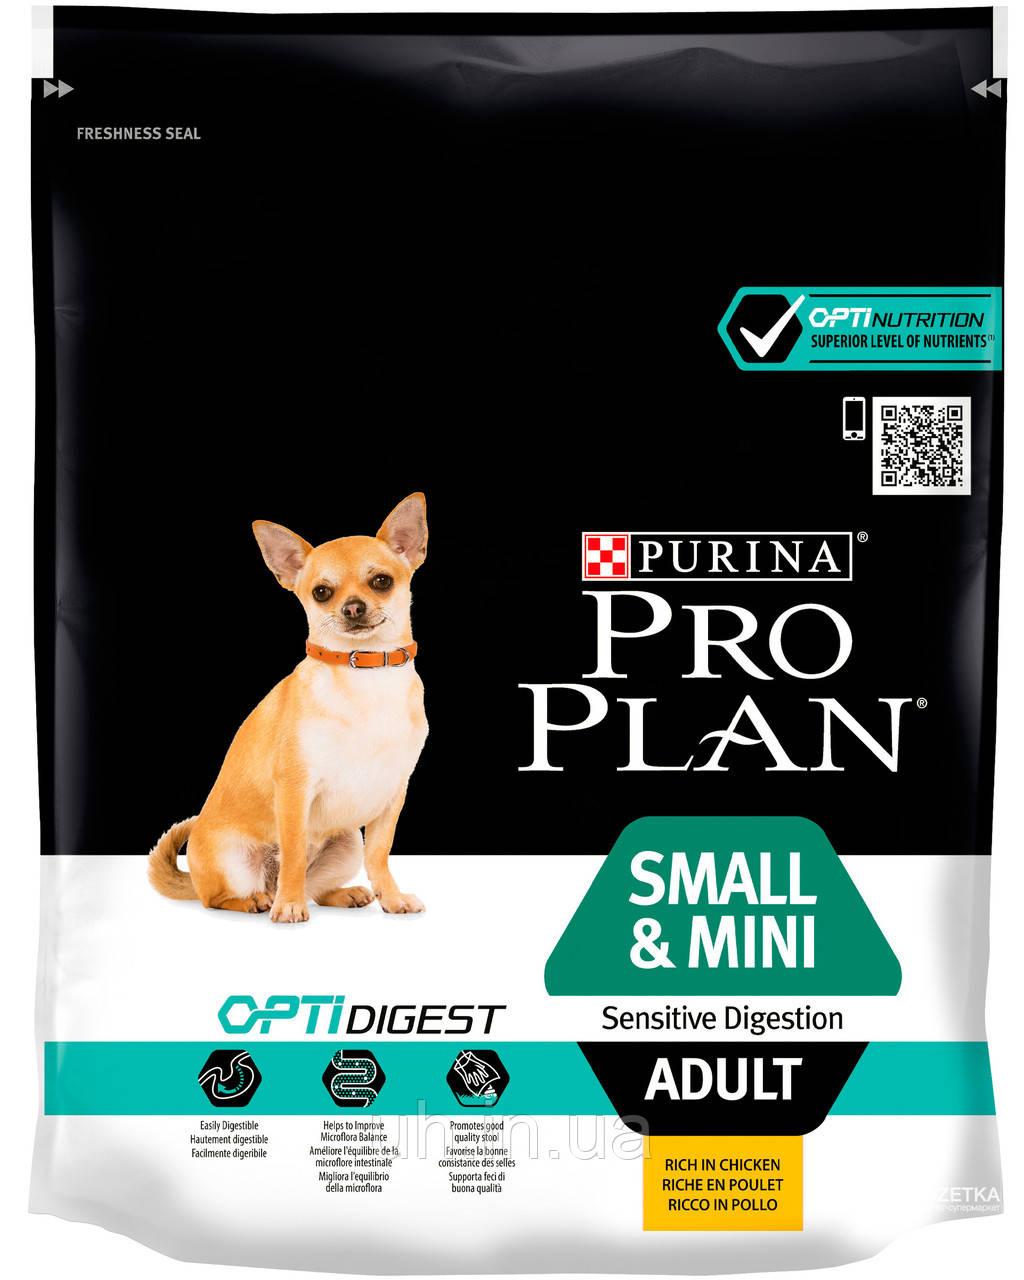 Про План Dog Small & Mini Adult Sensitive Digestion сухой корм для собак 0.7КГ